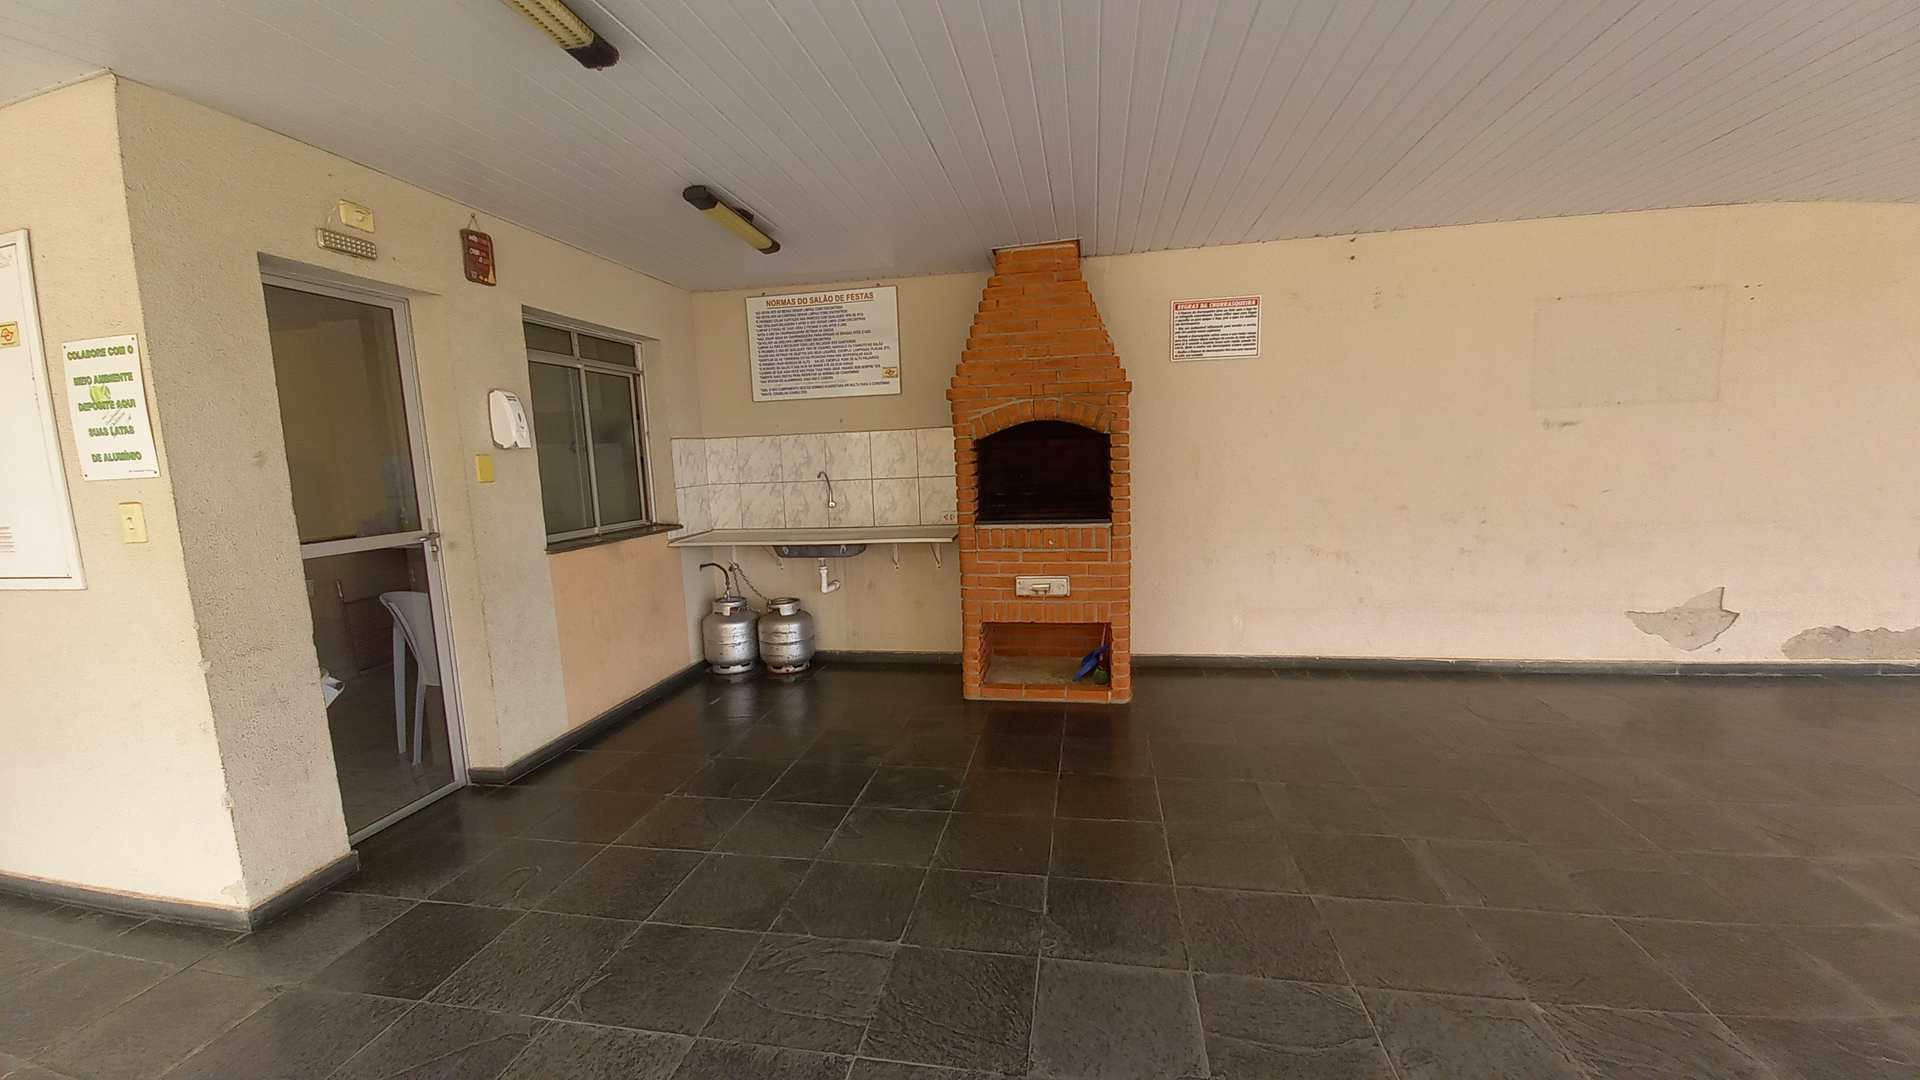 Apartamento com 2 dorms, Vila Urupês, Suzano - R$ 145 mil, Cod: 1277